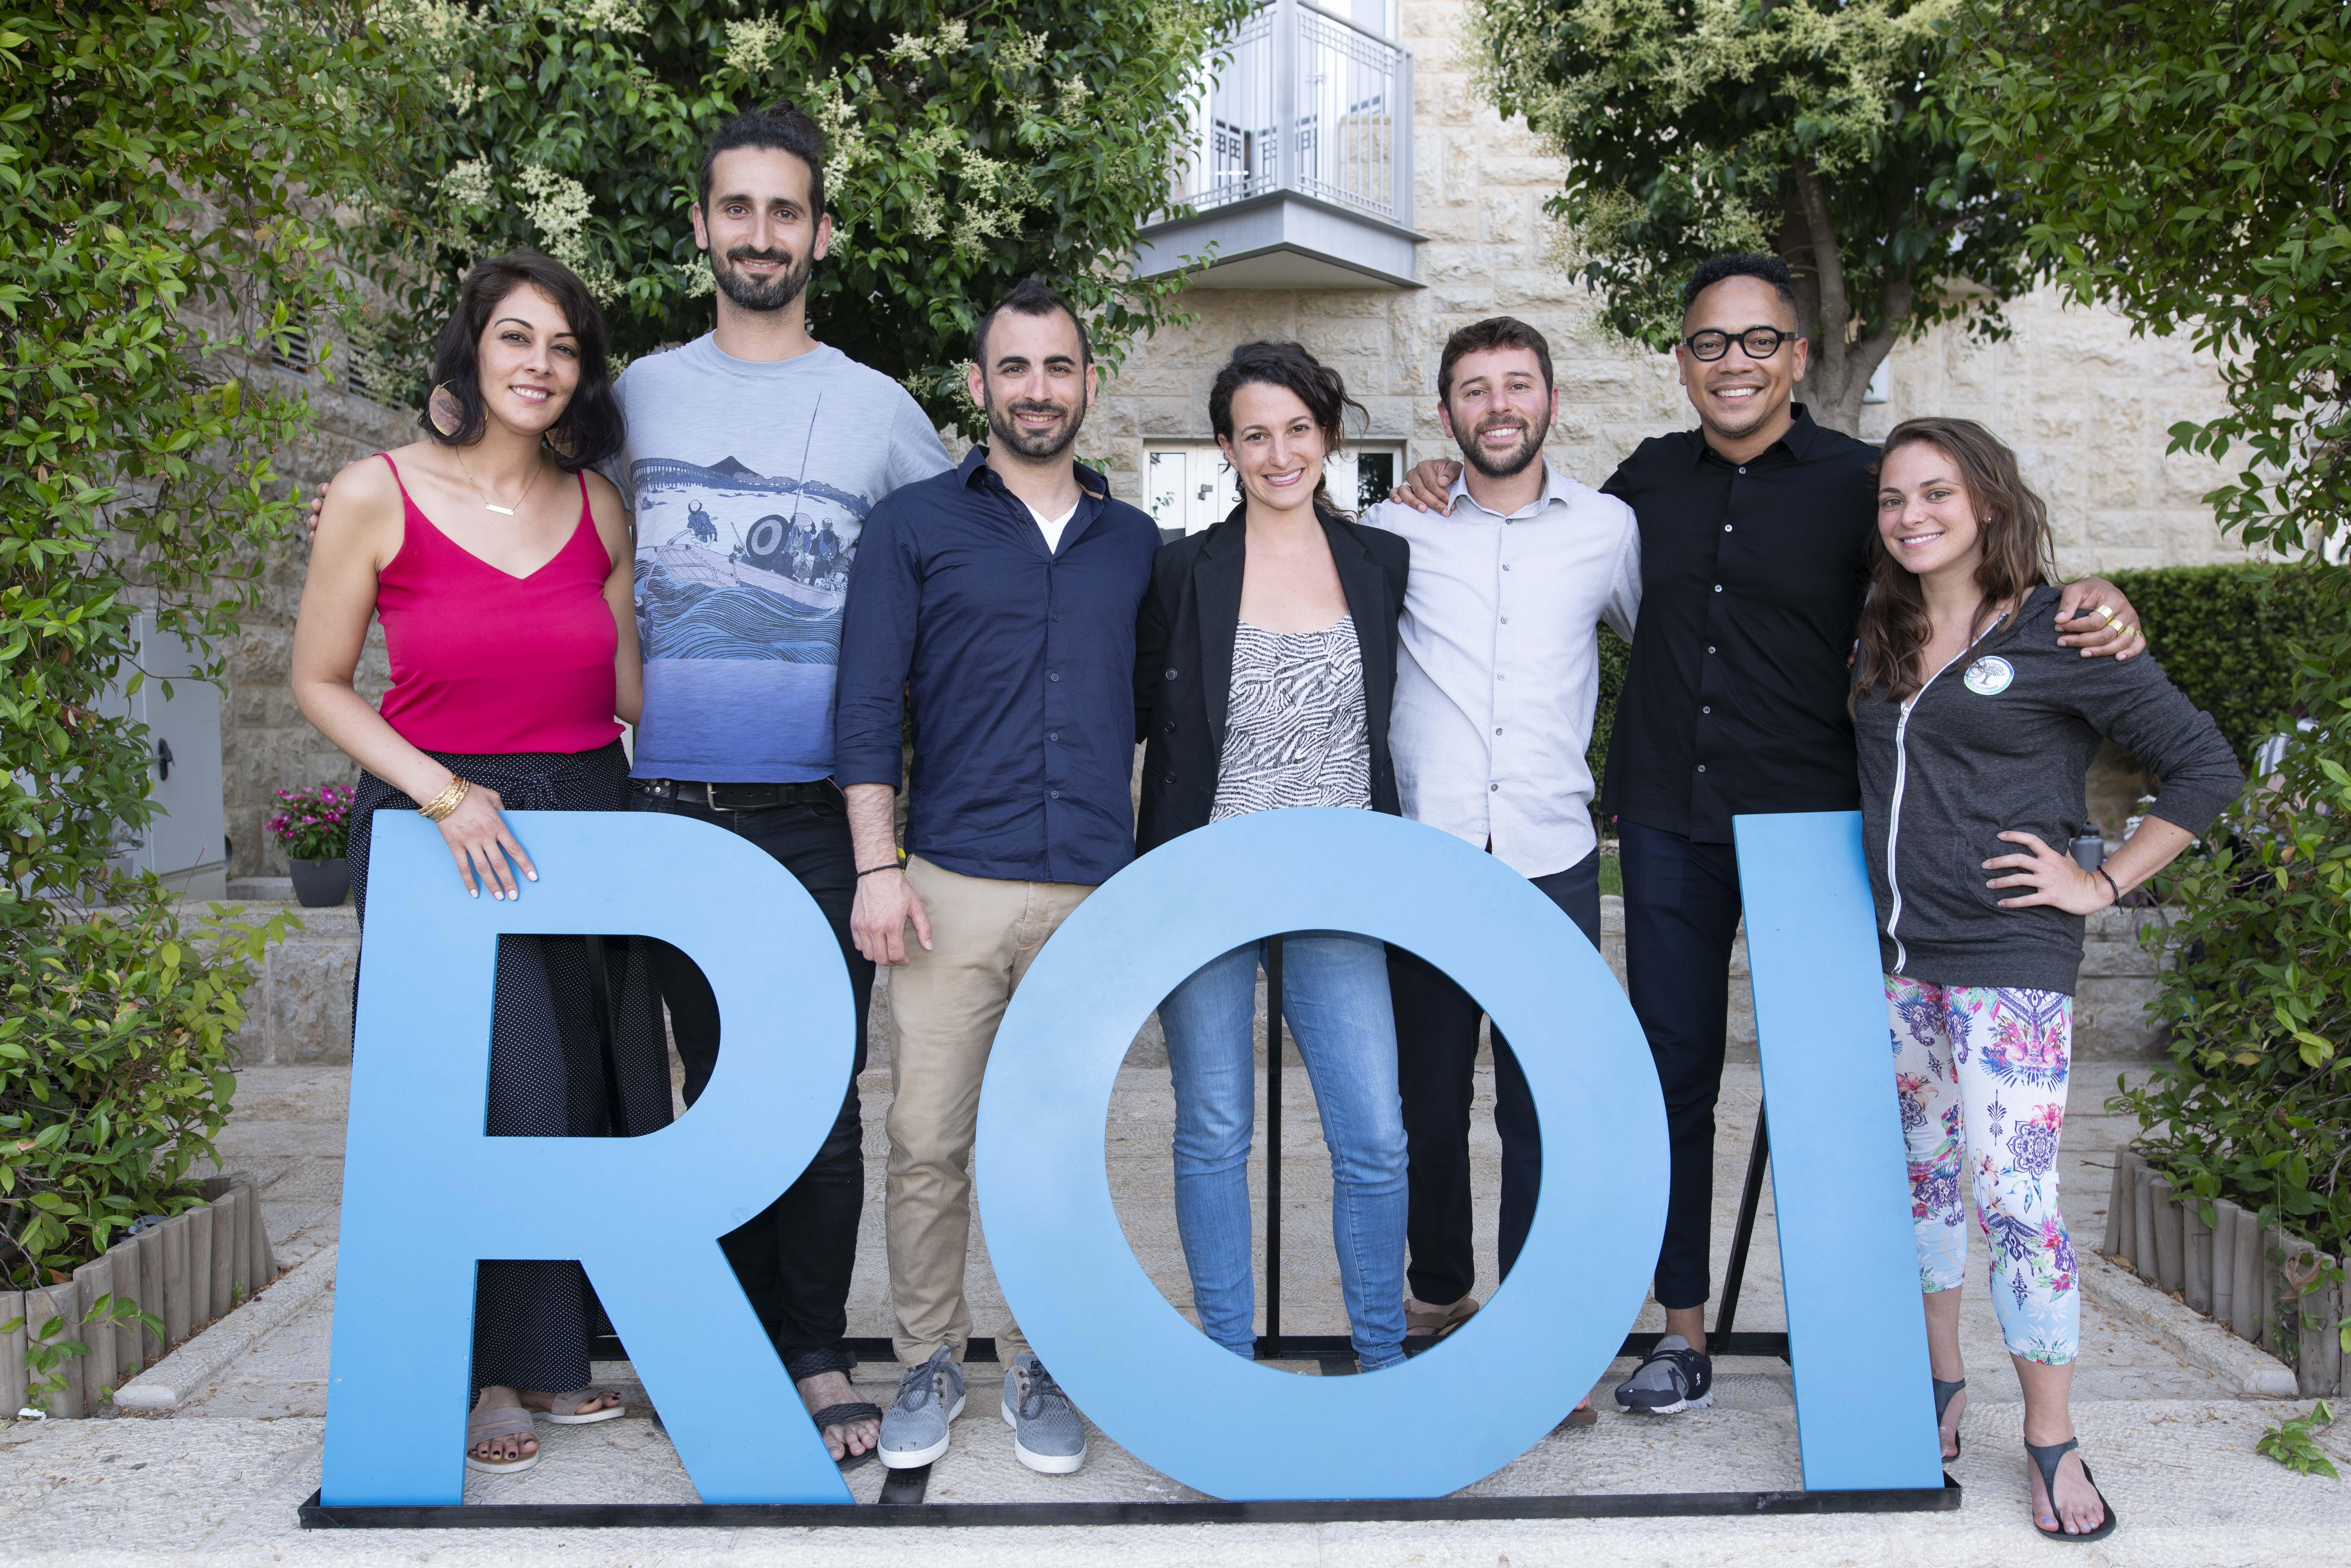 (From left) Leili Davari, Jonathan Matus, Gilad Shamri, Alona Metz, Misha Safyan, Angel Alvarez-Mapp and Courtney Cardin. (Photo/Snir Kazir)